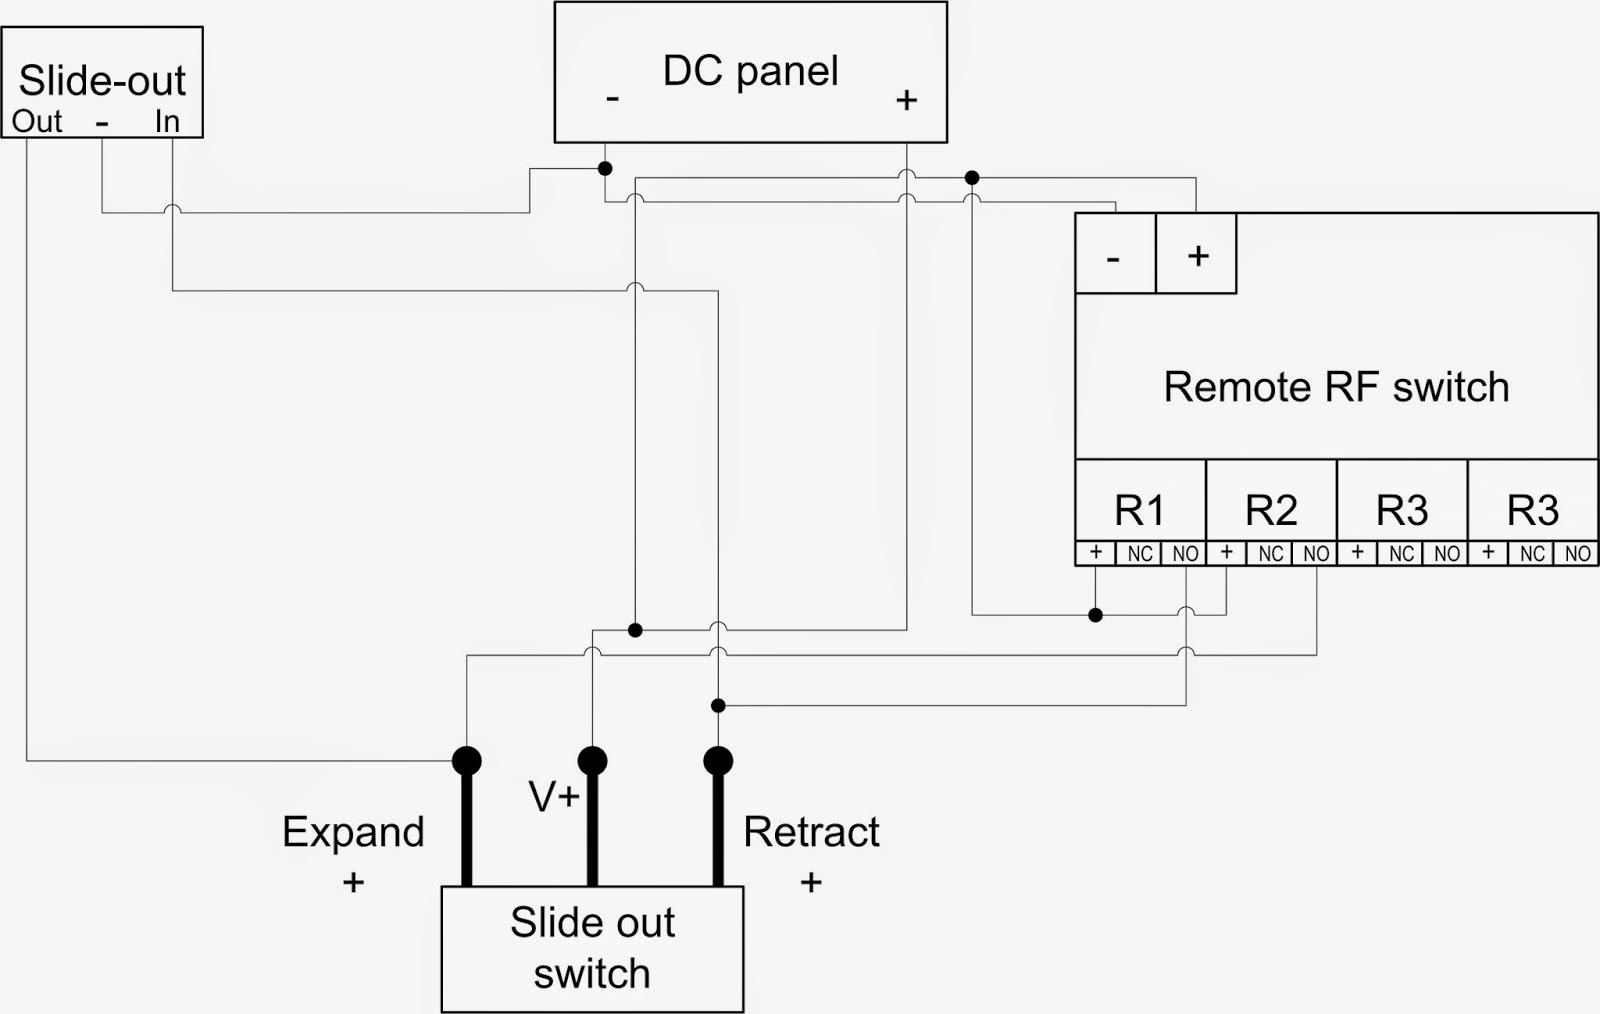 Phenomenal Slide Wiring Diagram Online Wiring Diagram Wiring Cloud Overrenstrafr09Org